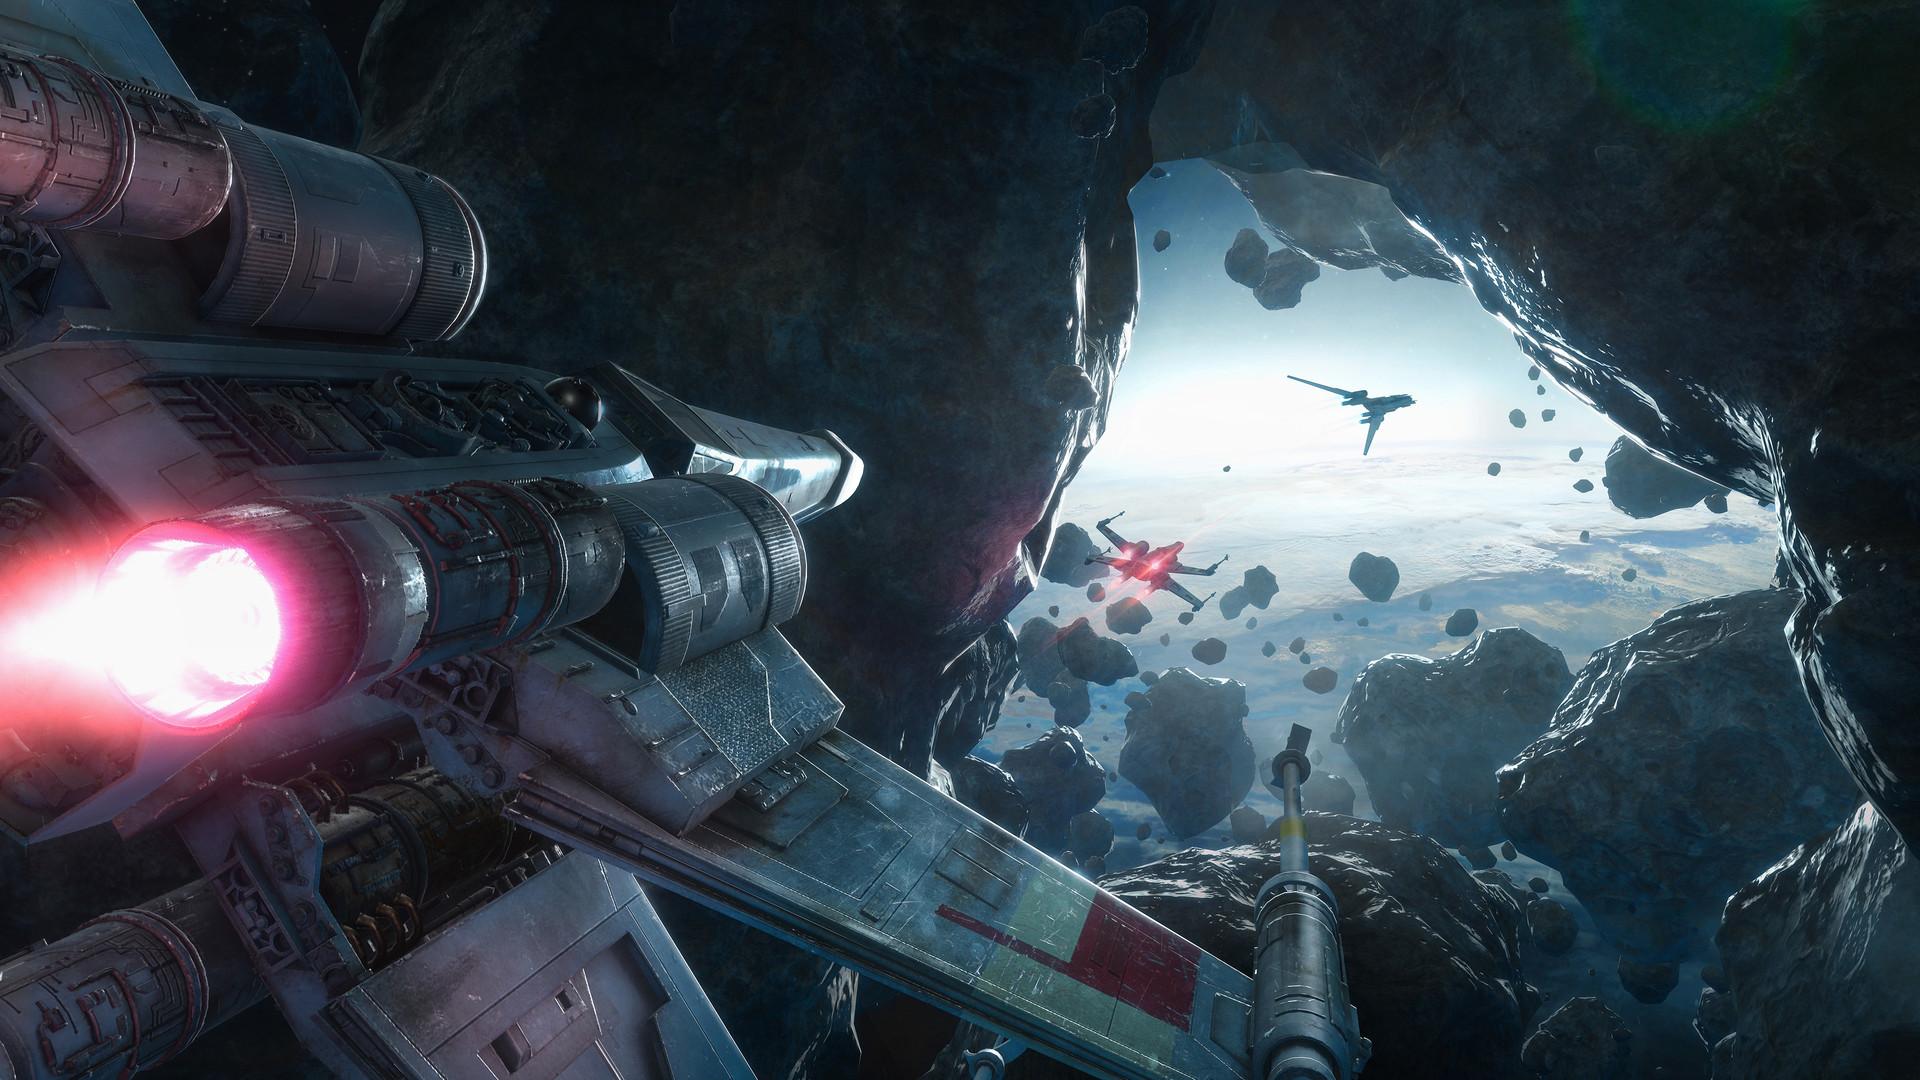 Darius kalinauskas starwars rougeone background xwing uwing asteroids